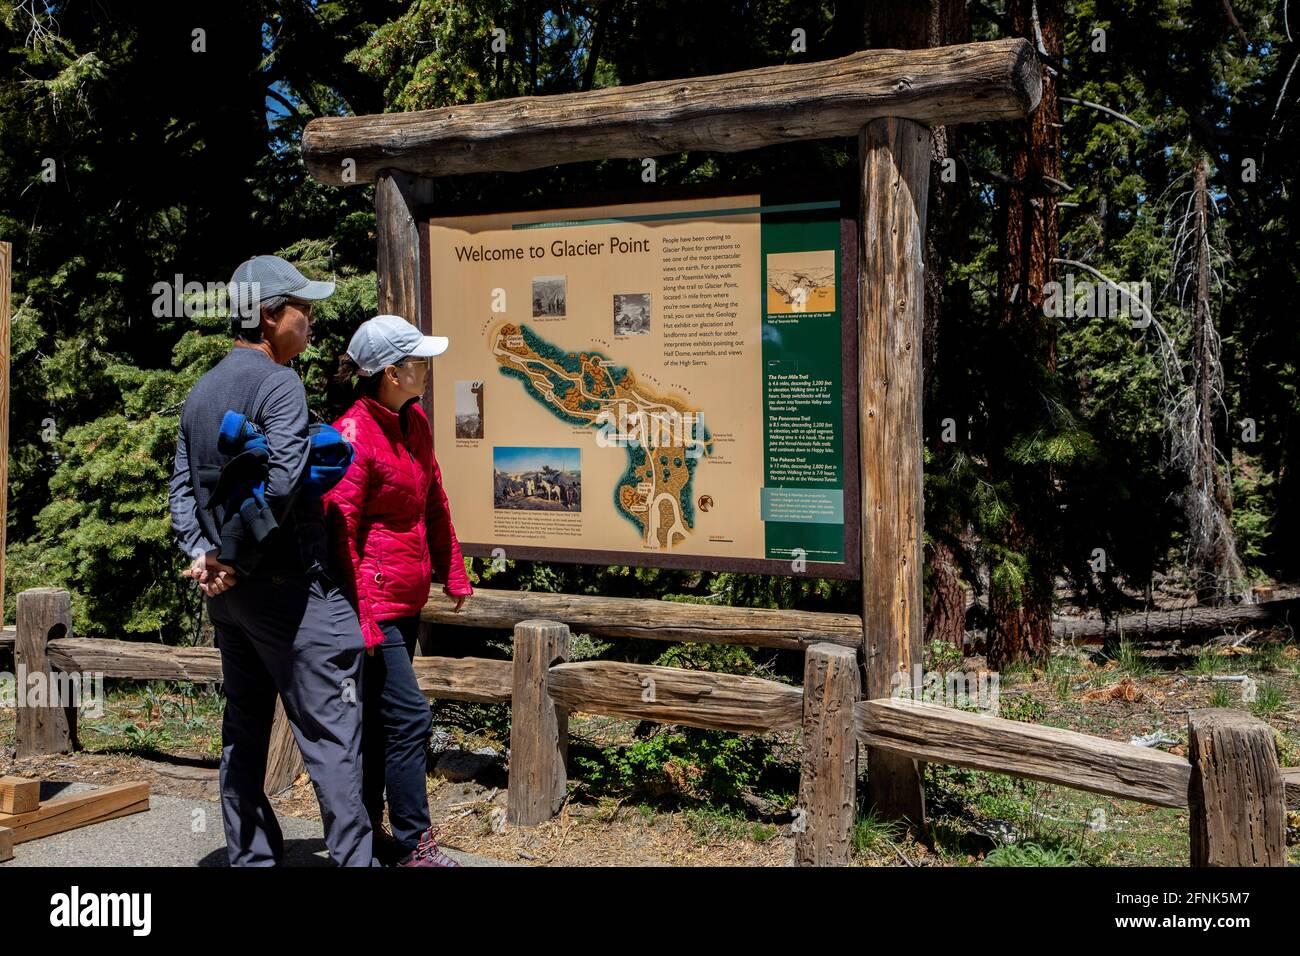 Cartina Yosemite National Park.Yosemite Map High Resolution Stock Photography And Images Alamy